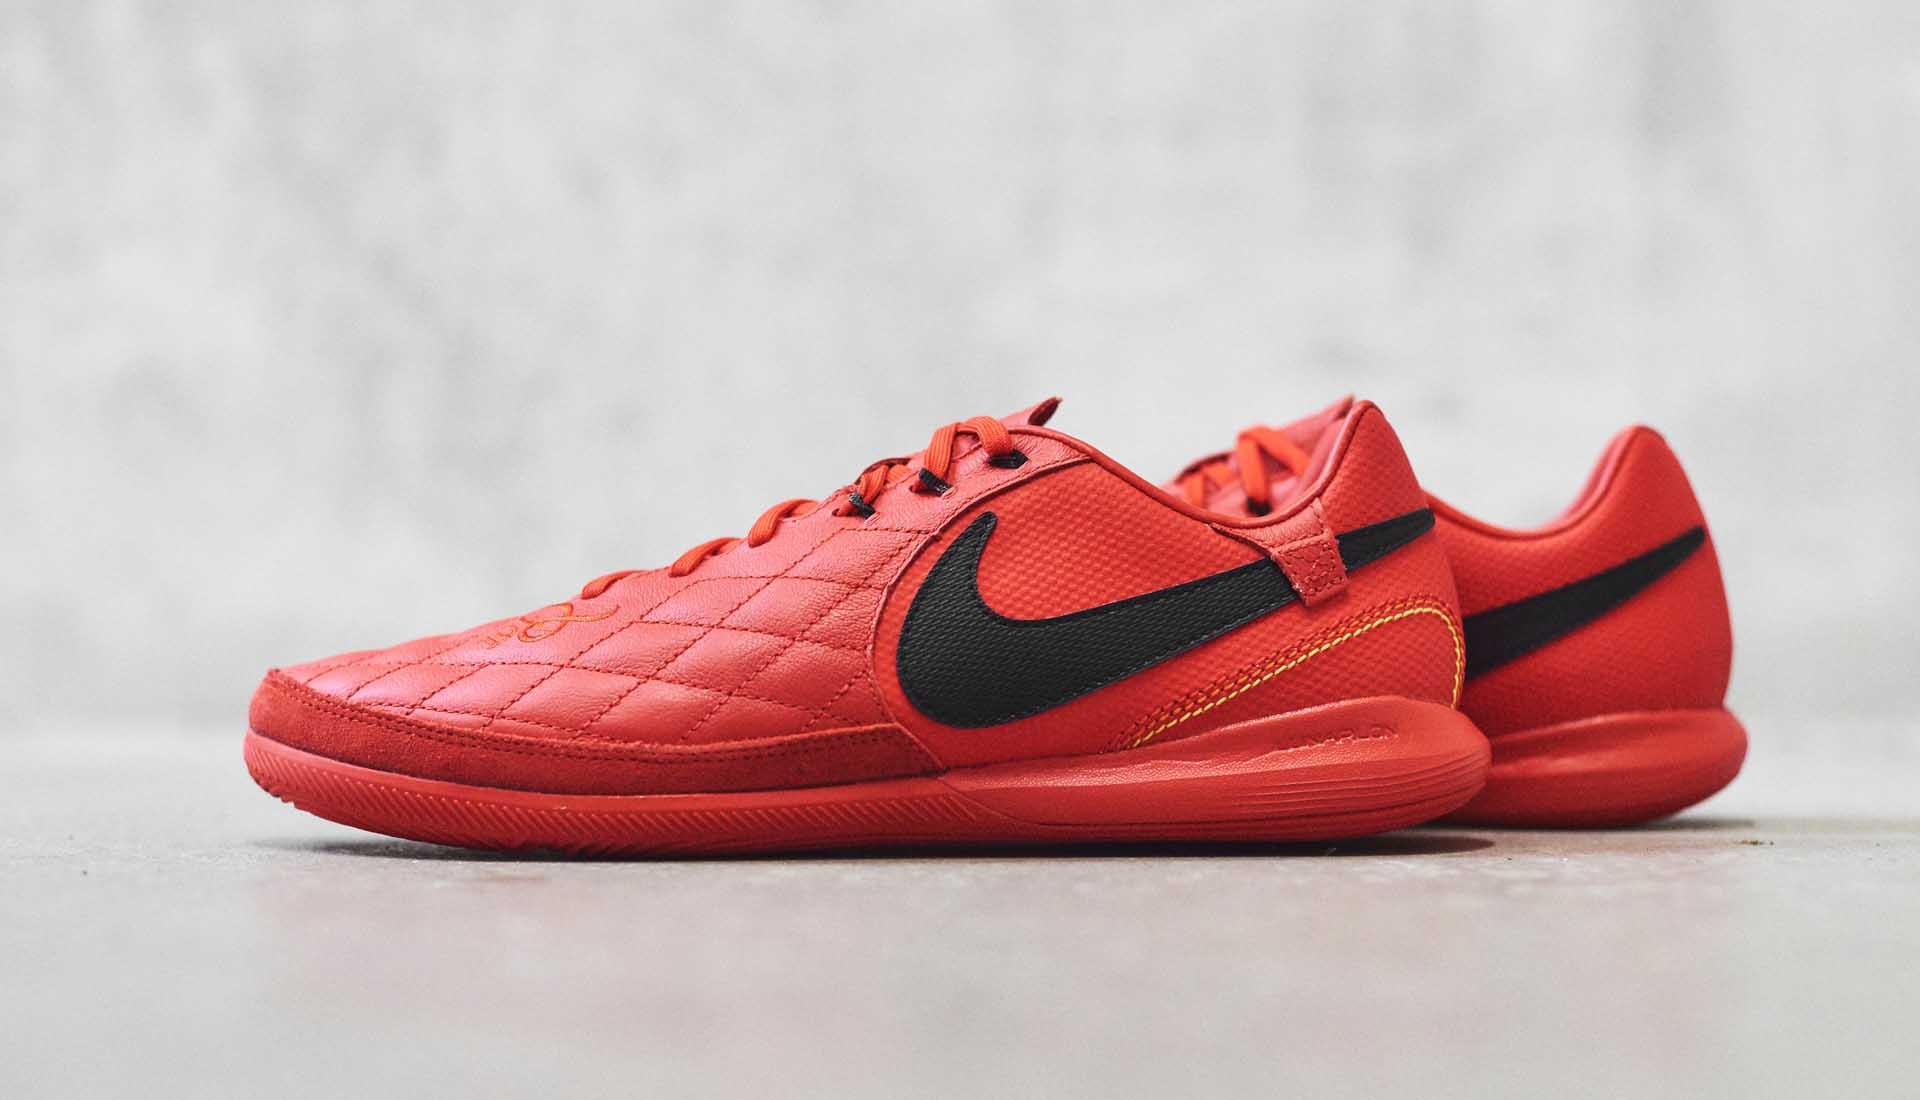 Concurso Piquete Mal humor  Nike Launch The 10R LegendX Barcelona & Milan Editions - SoccerBible